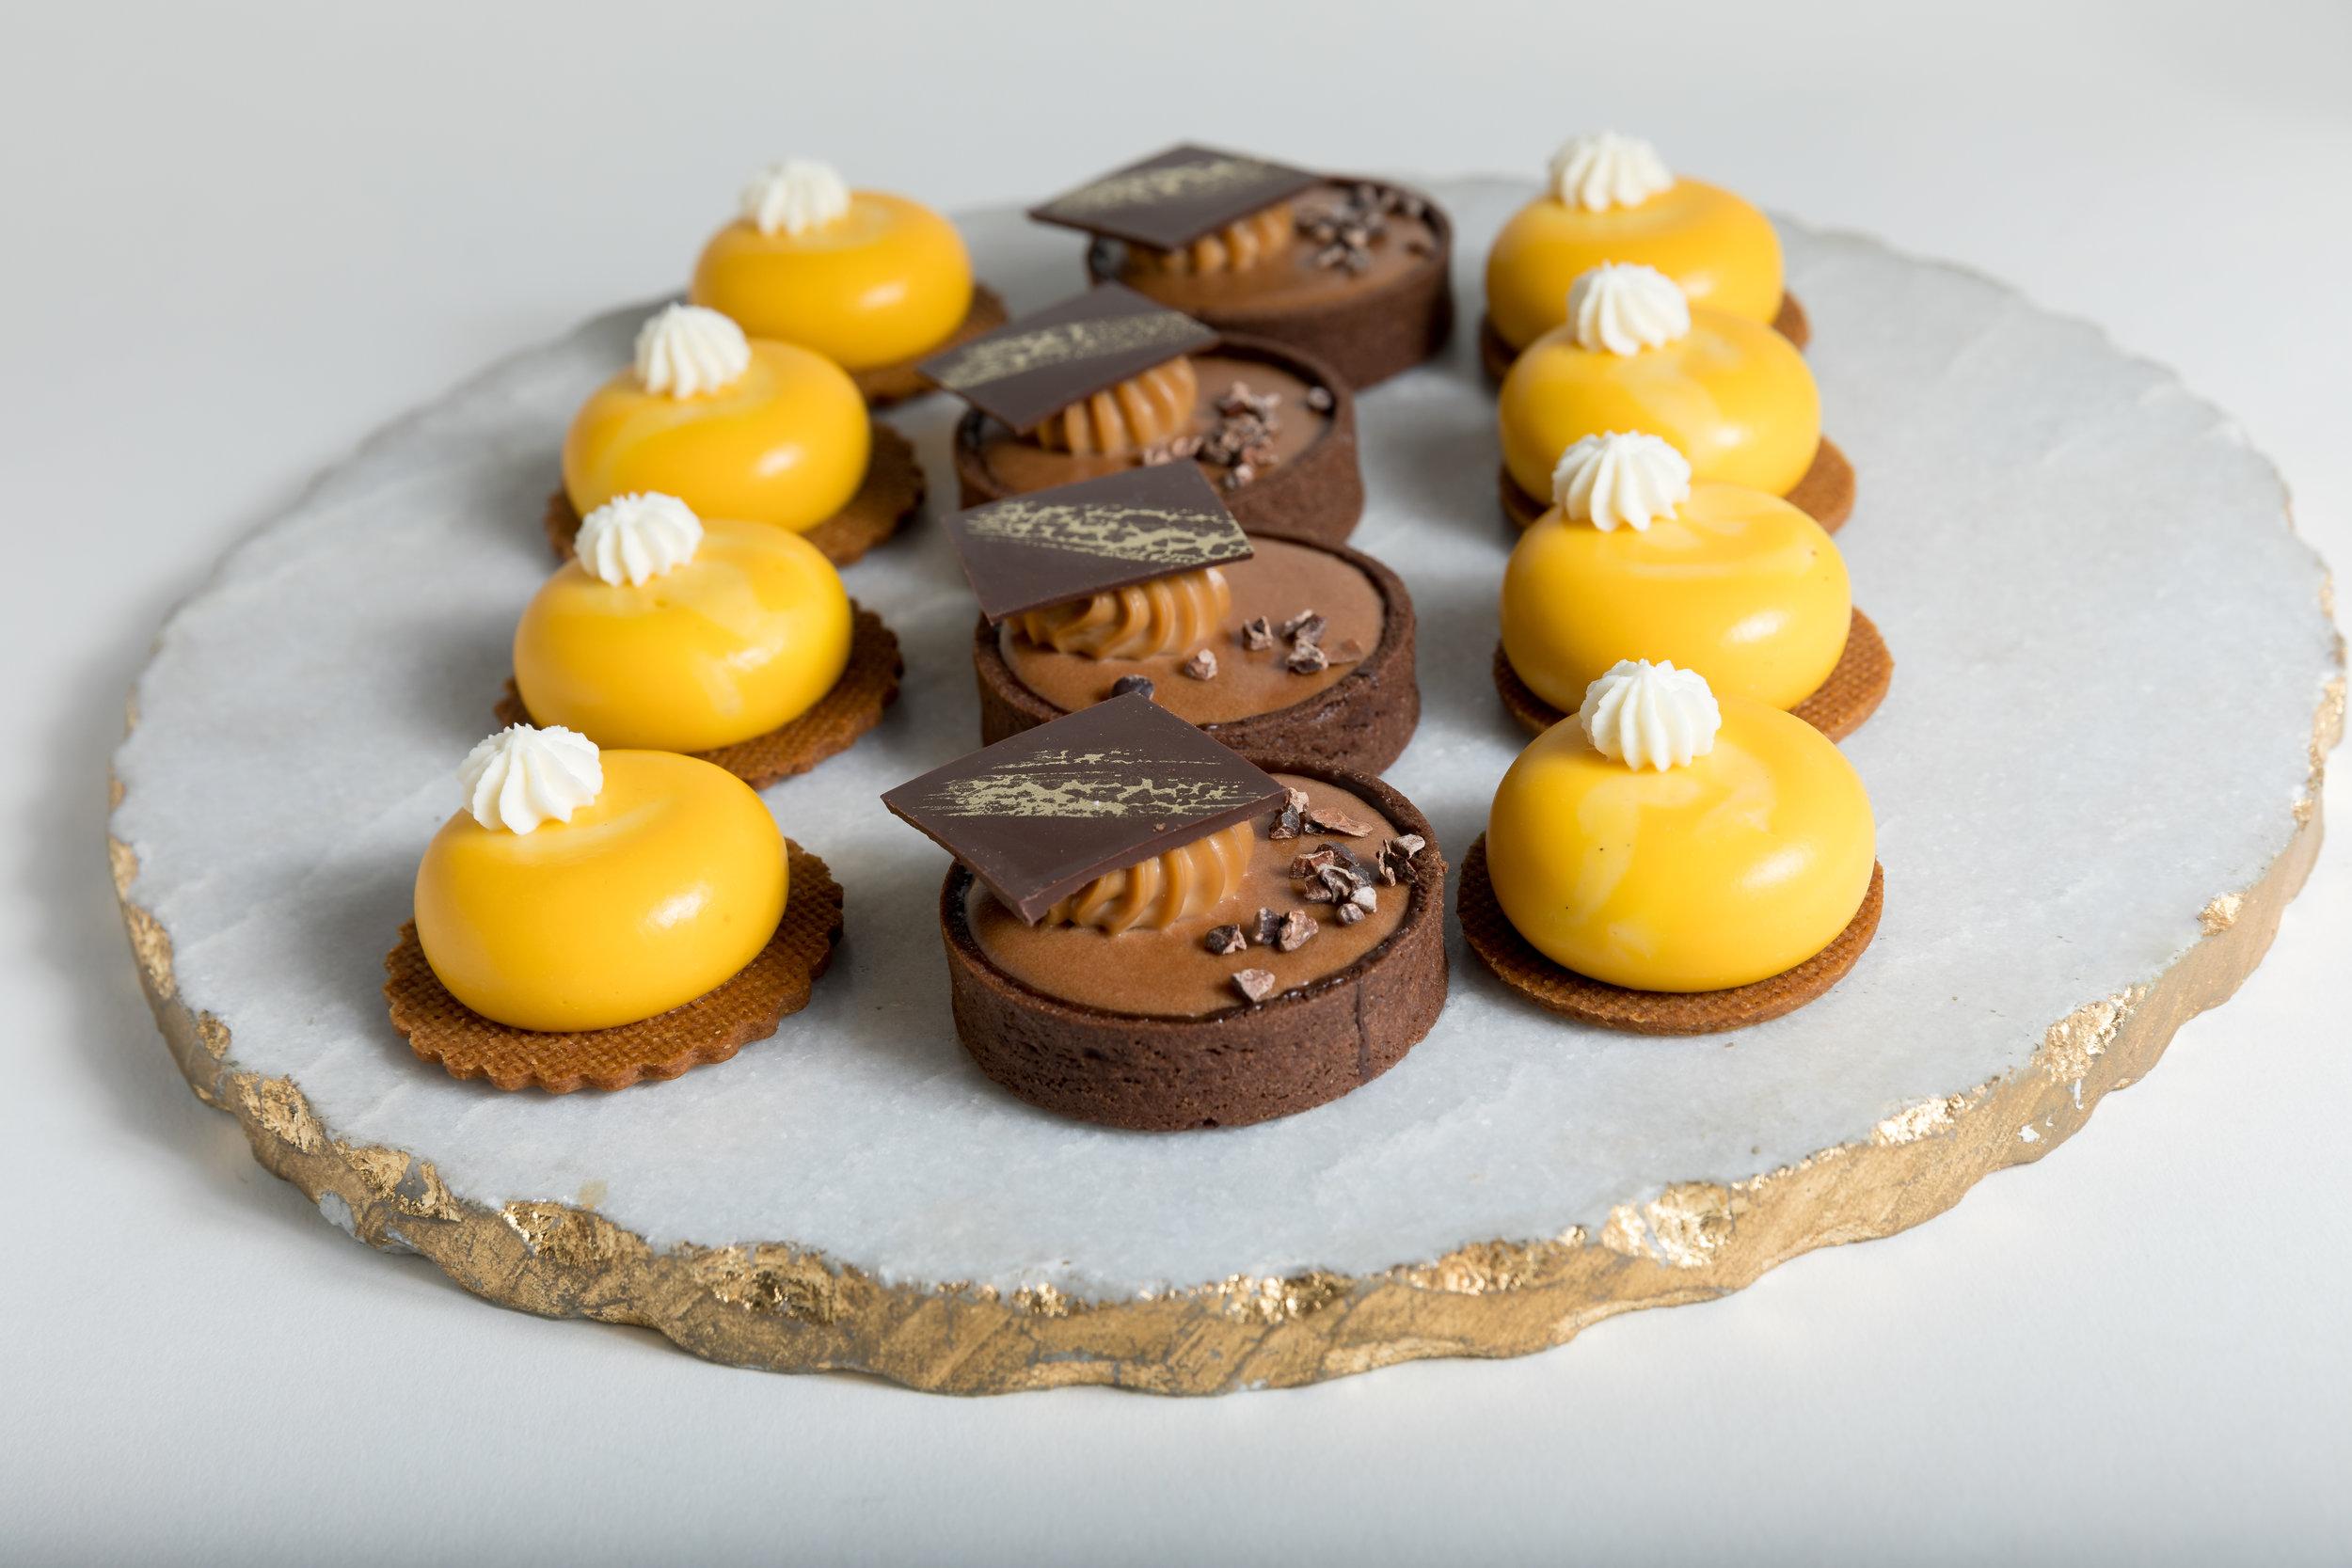 GP_Dessert_Spring_Amanda_Gentile_ADGPhotography_1_19-95 (2).jpg